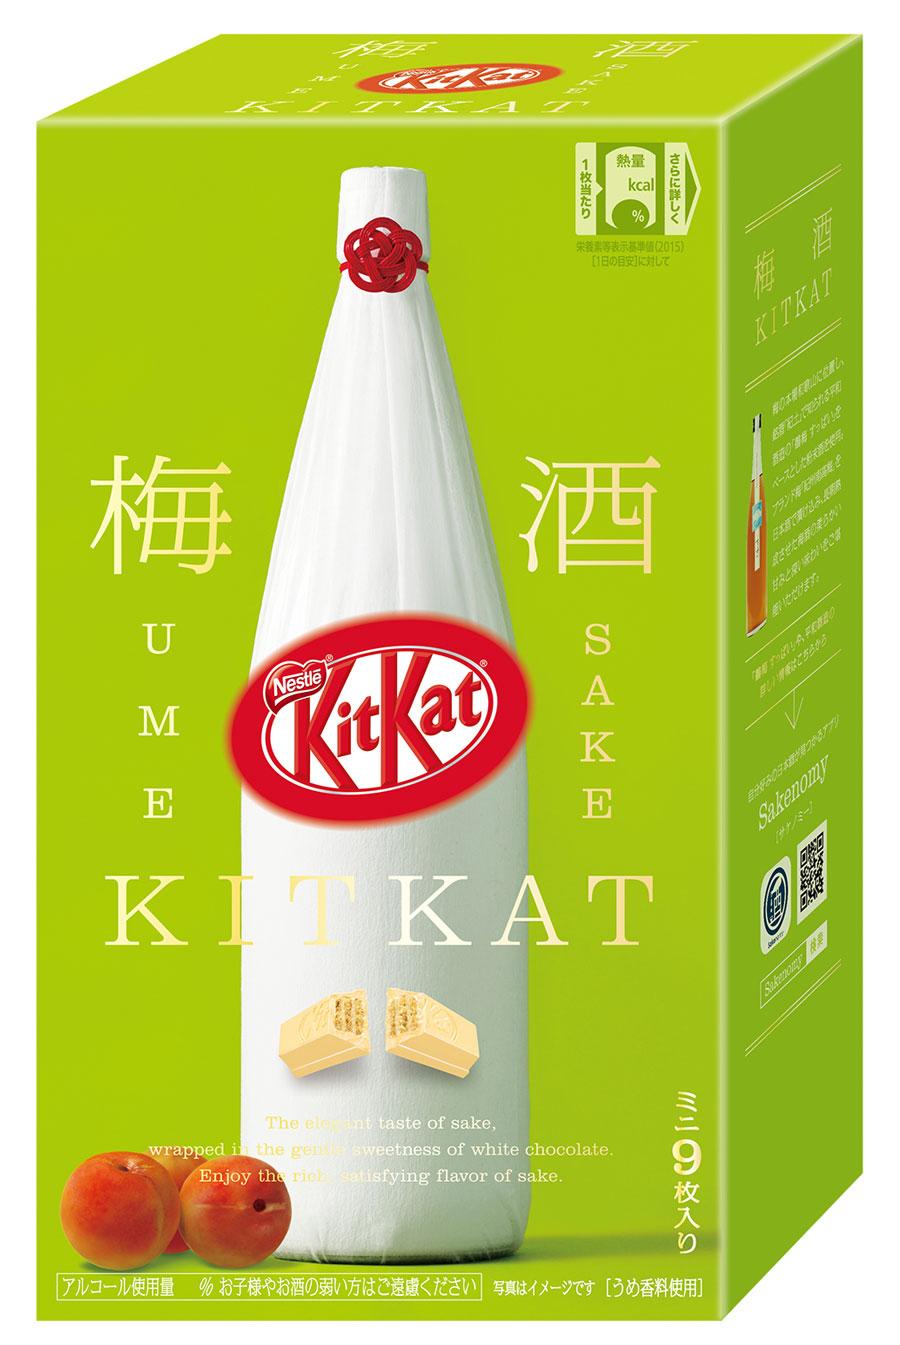 Kit Kit de Umeshu por PratoFundo.com